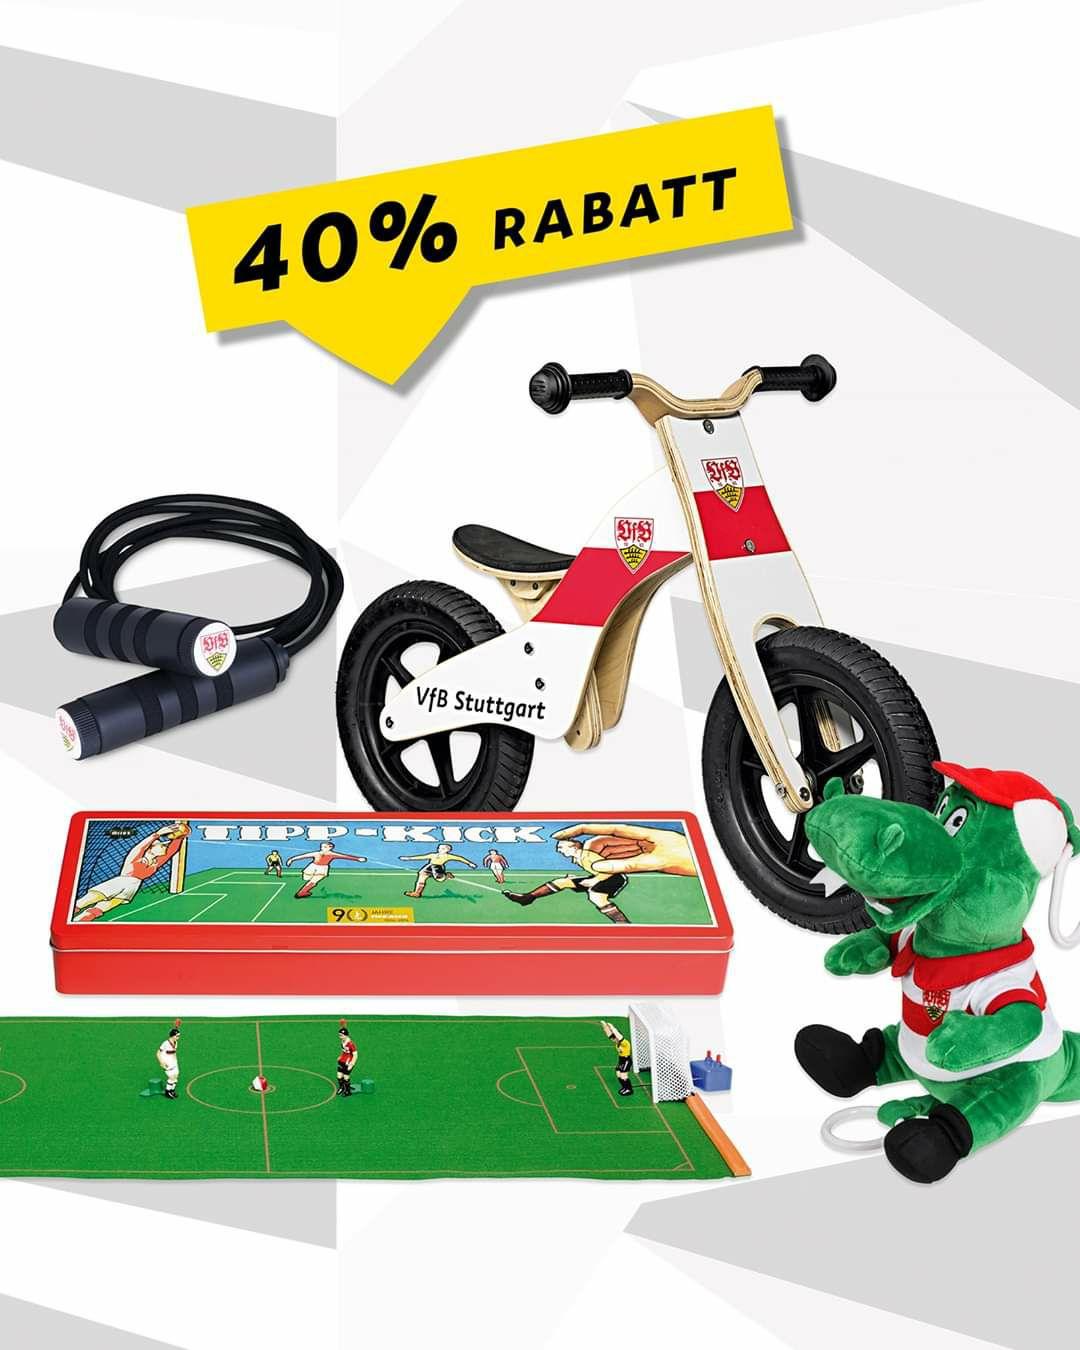 VfB Stuttgart - Rabatte im VfB Onlineshop